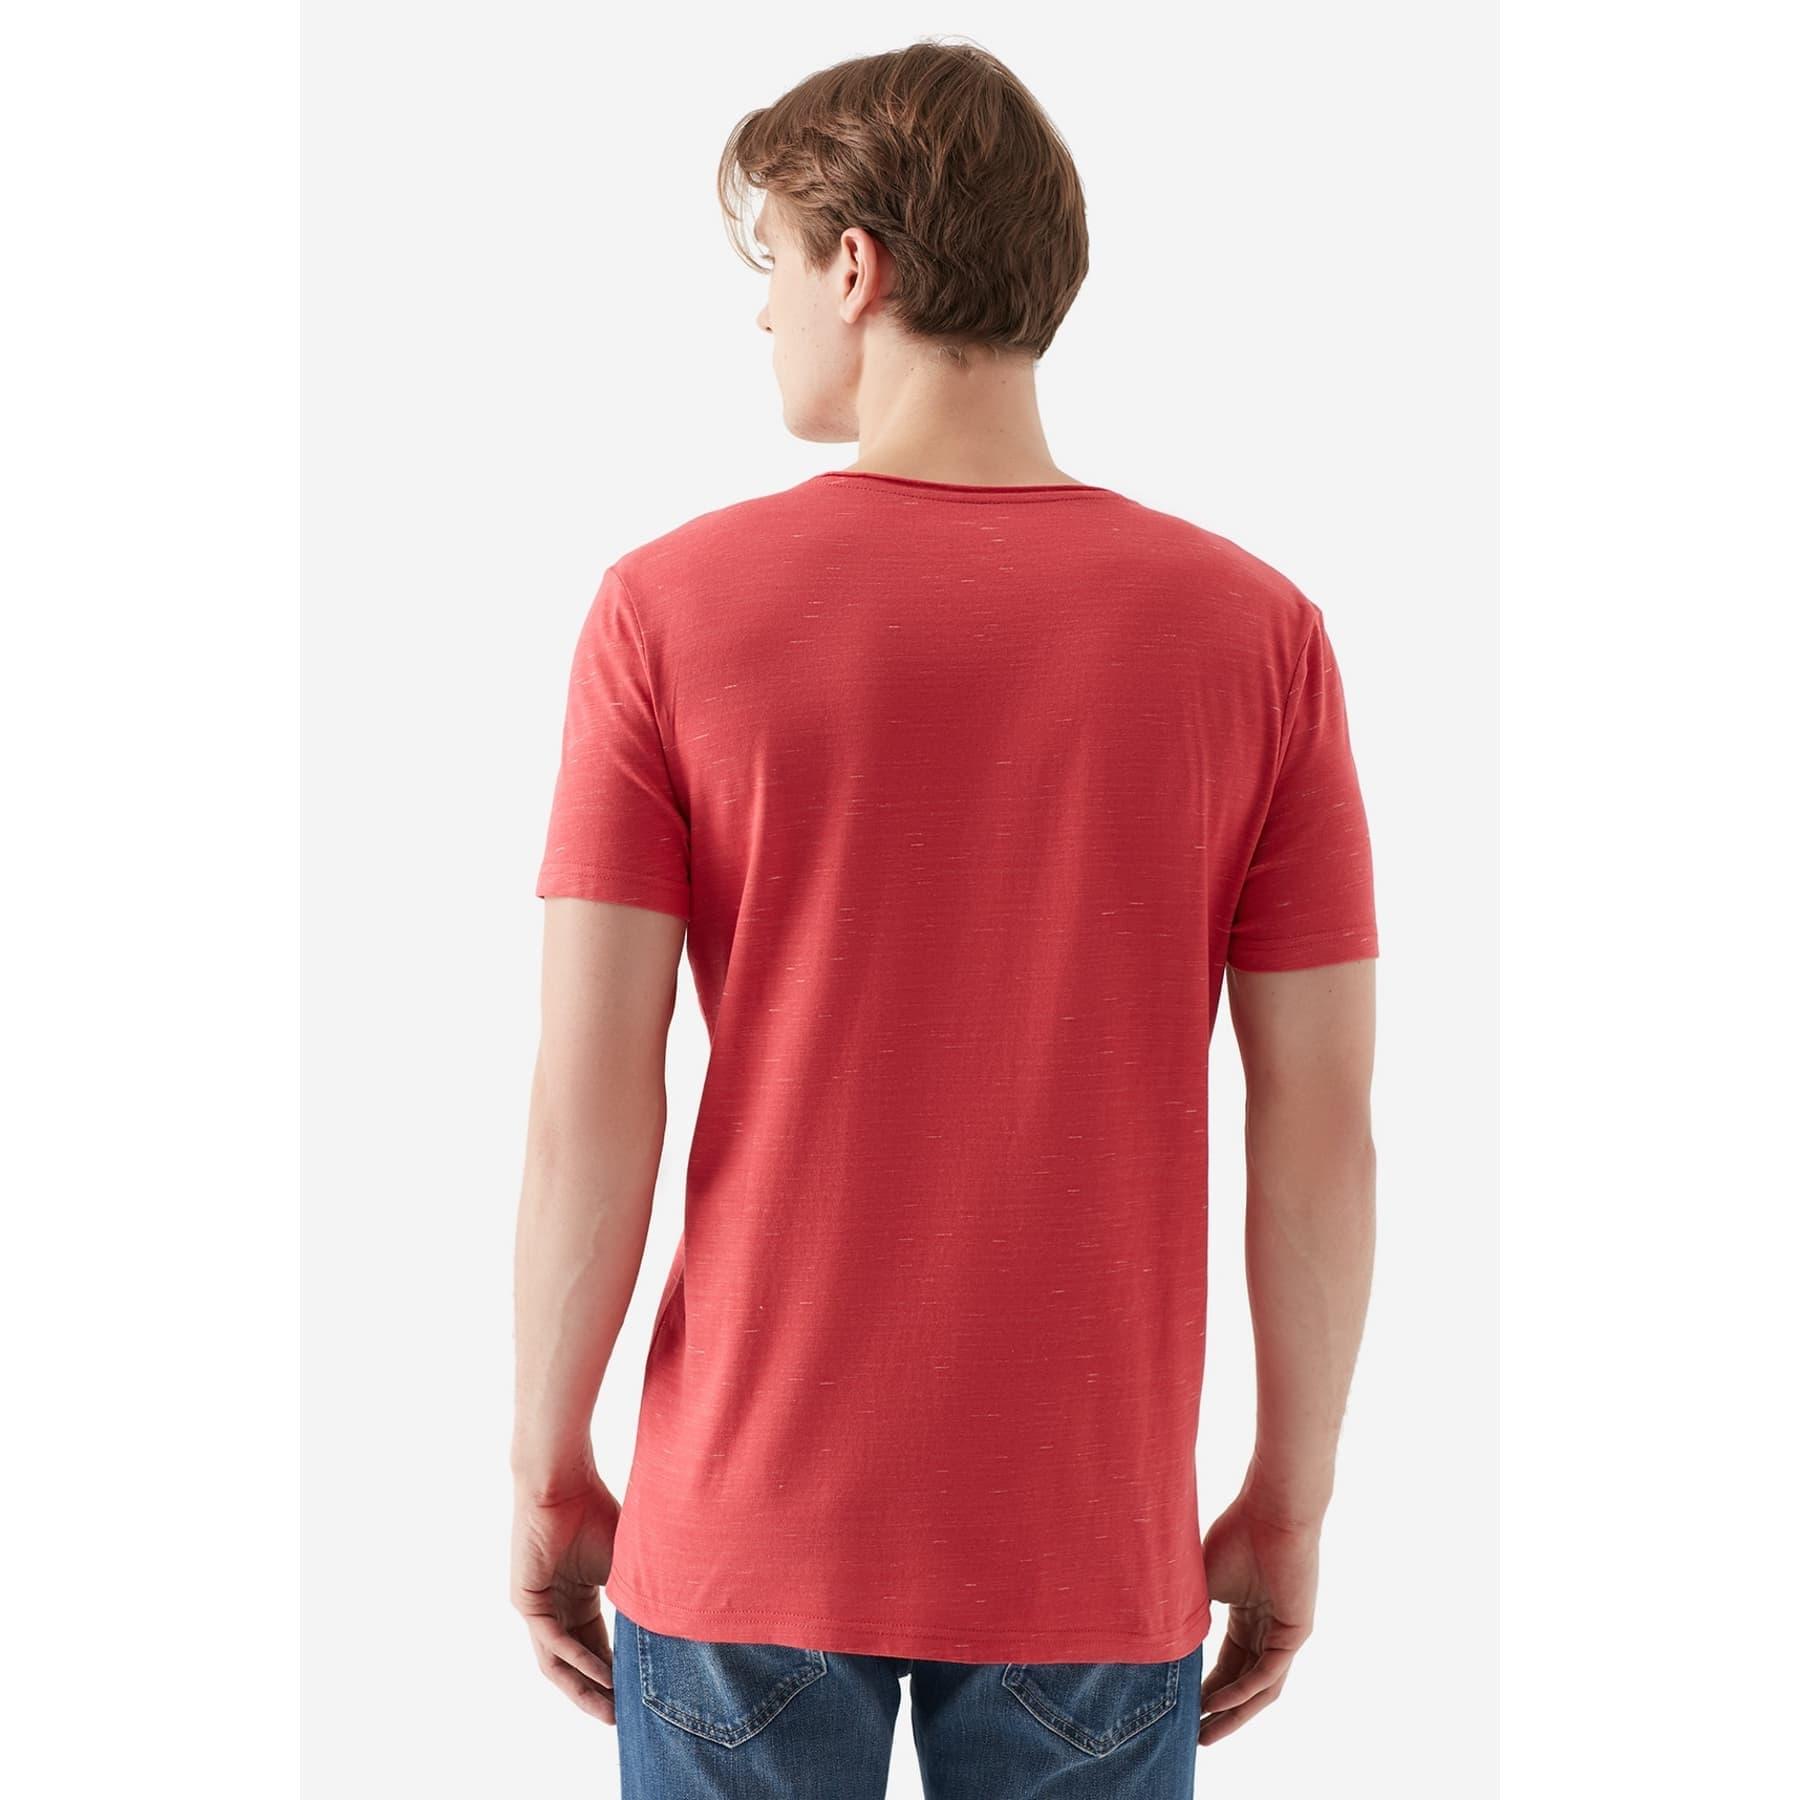 Tişört Canlı Kırmızı